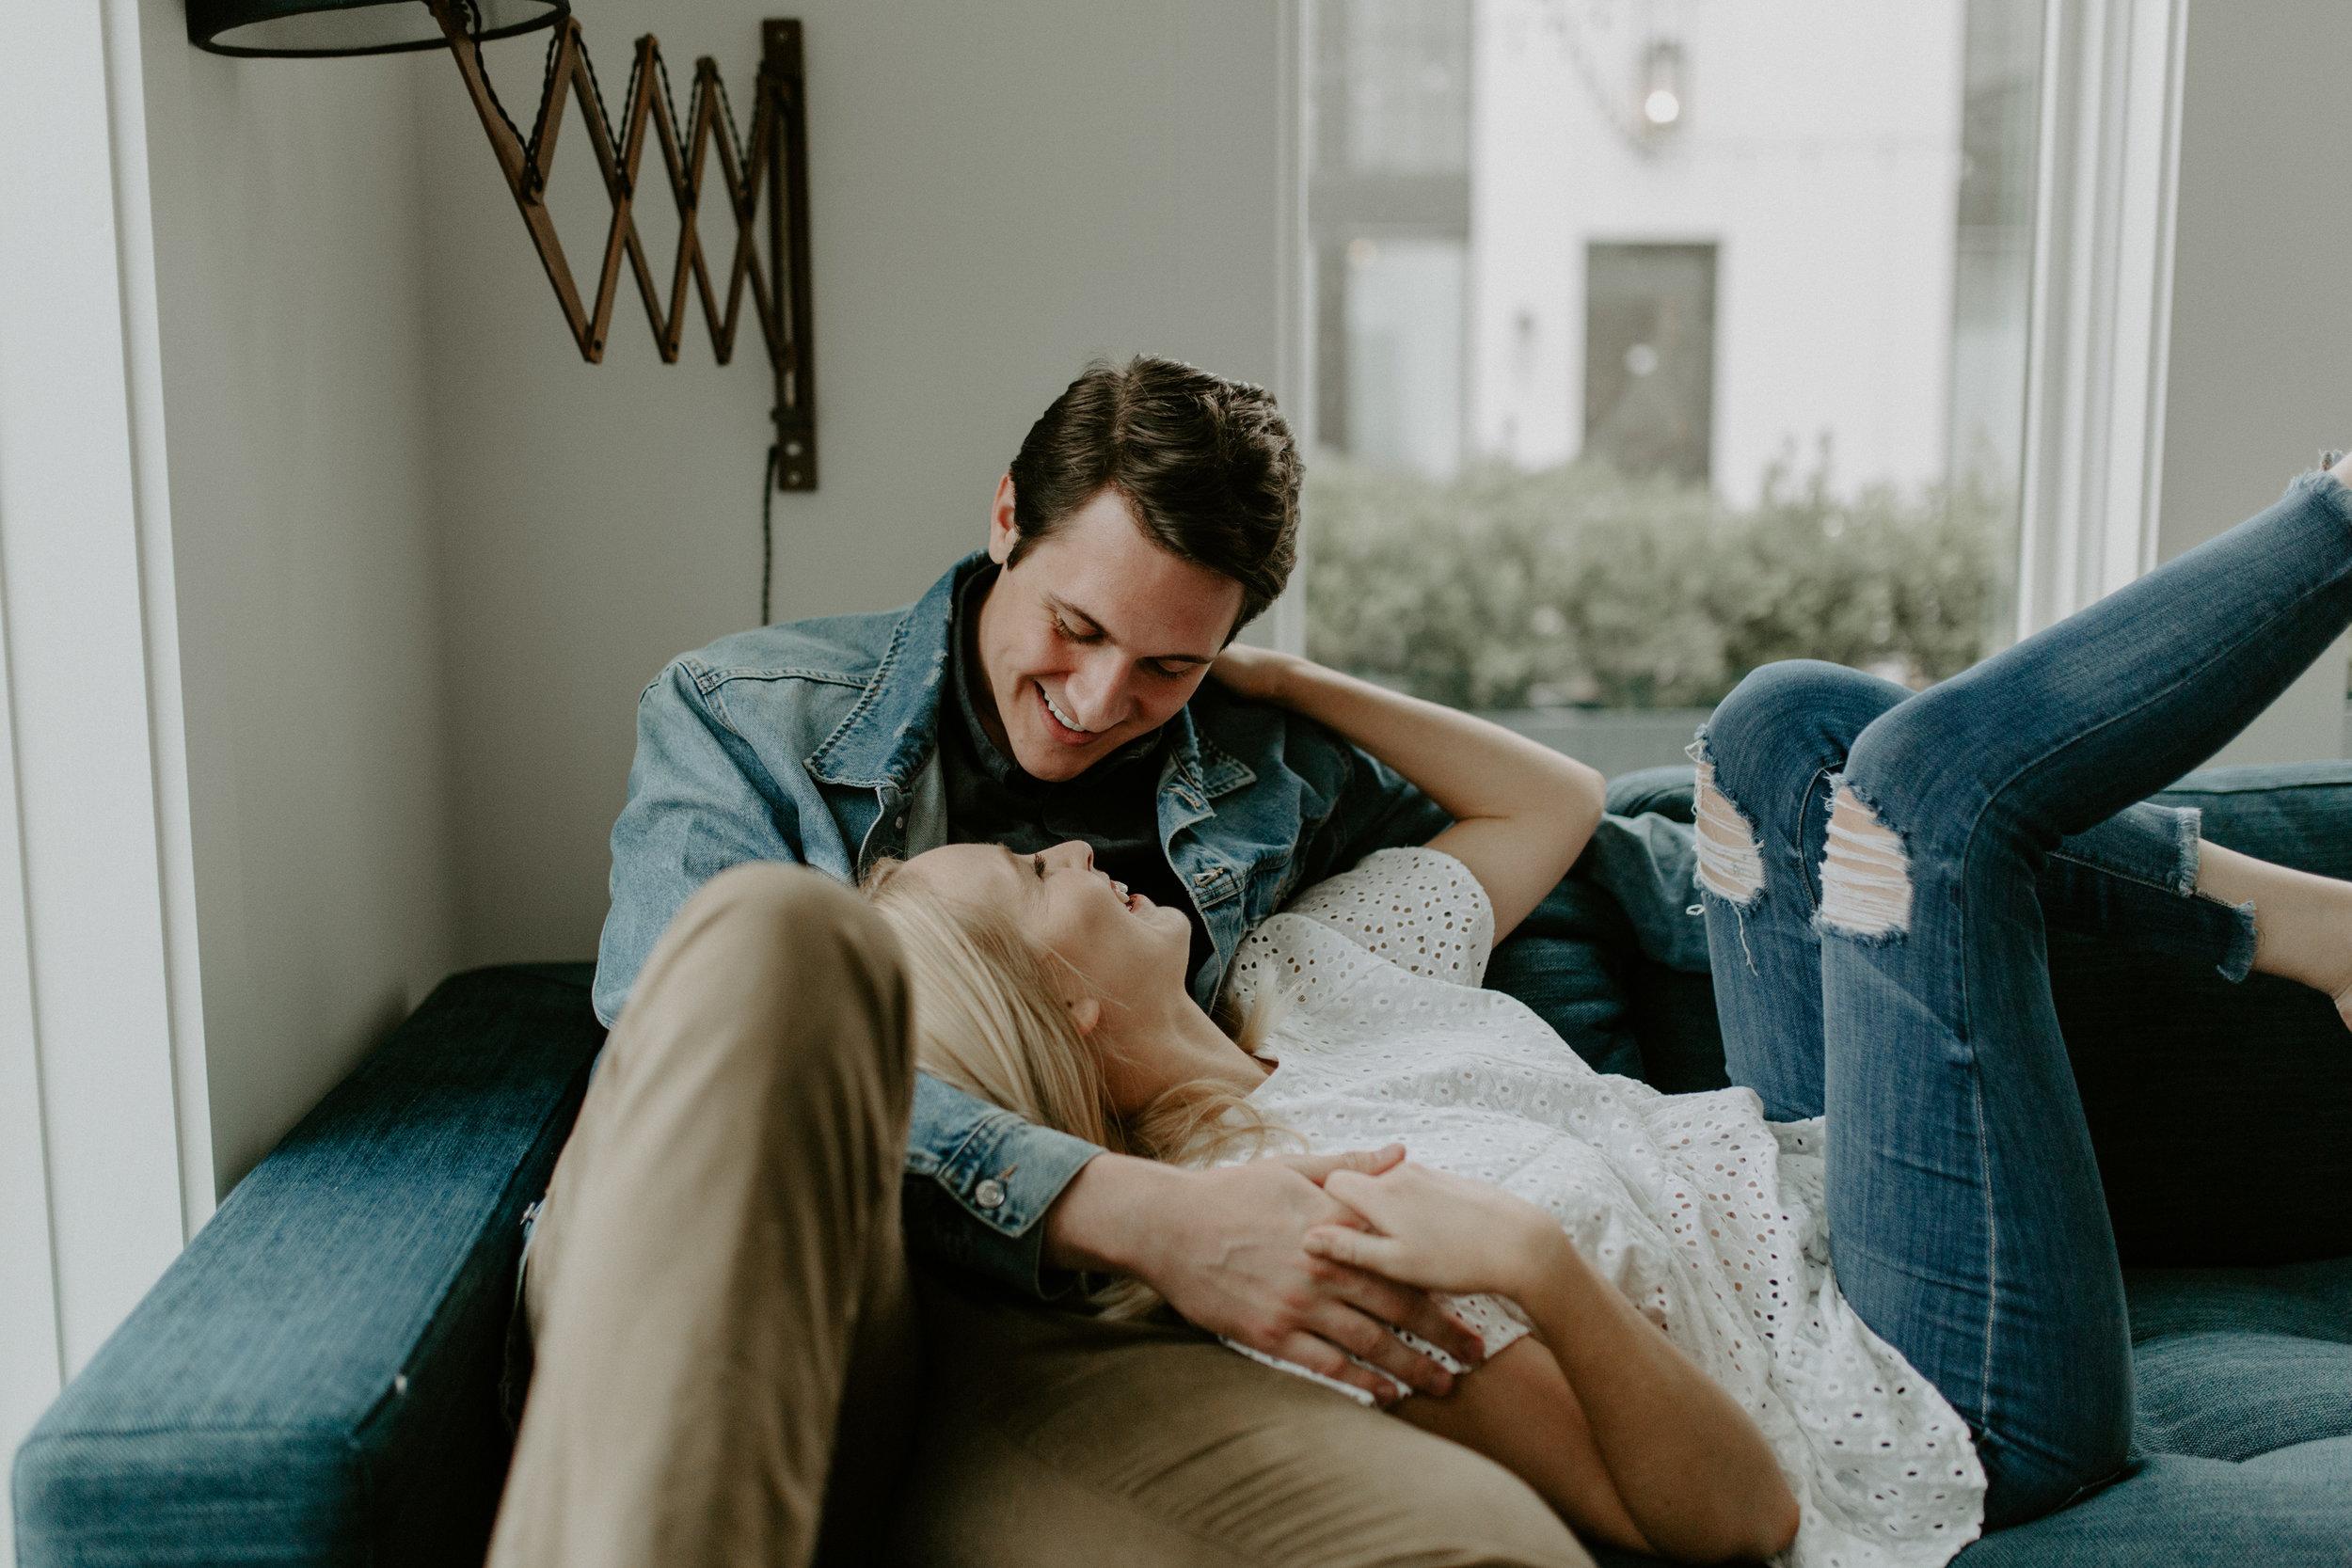 nashville_tn_wedding_photographer_collab_wright_photographs_0210.JPG